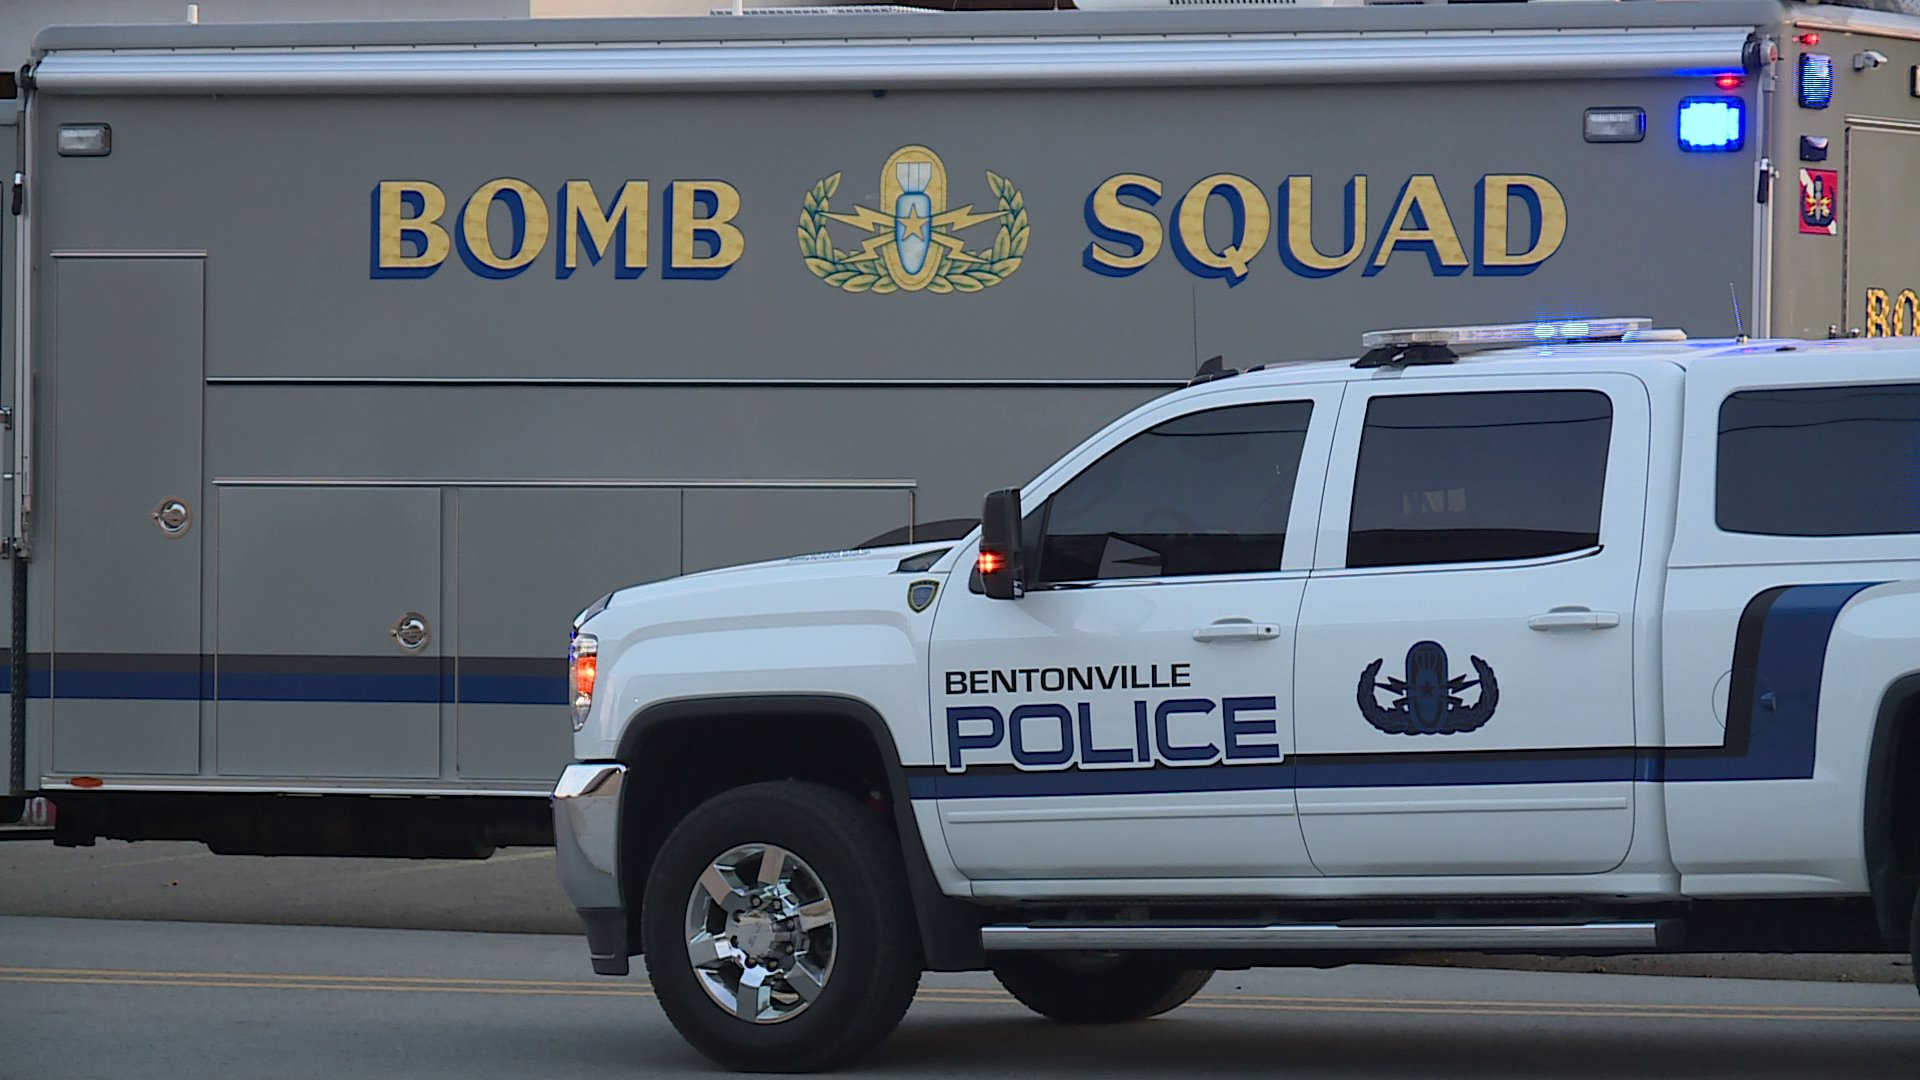 bomb-squad-greenland-police